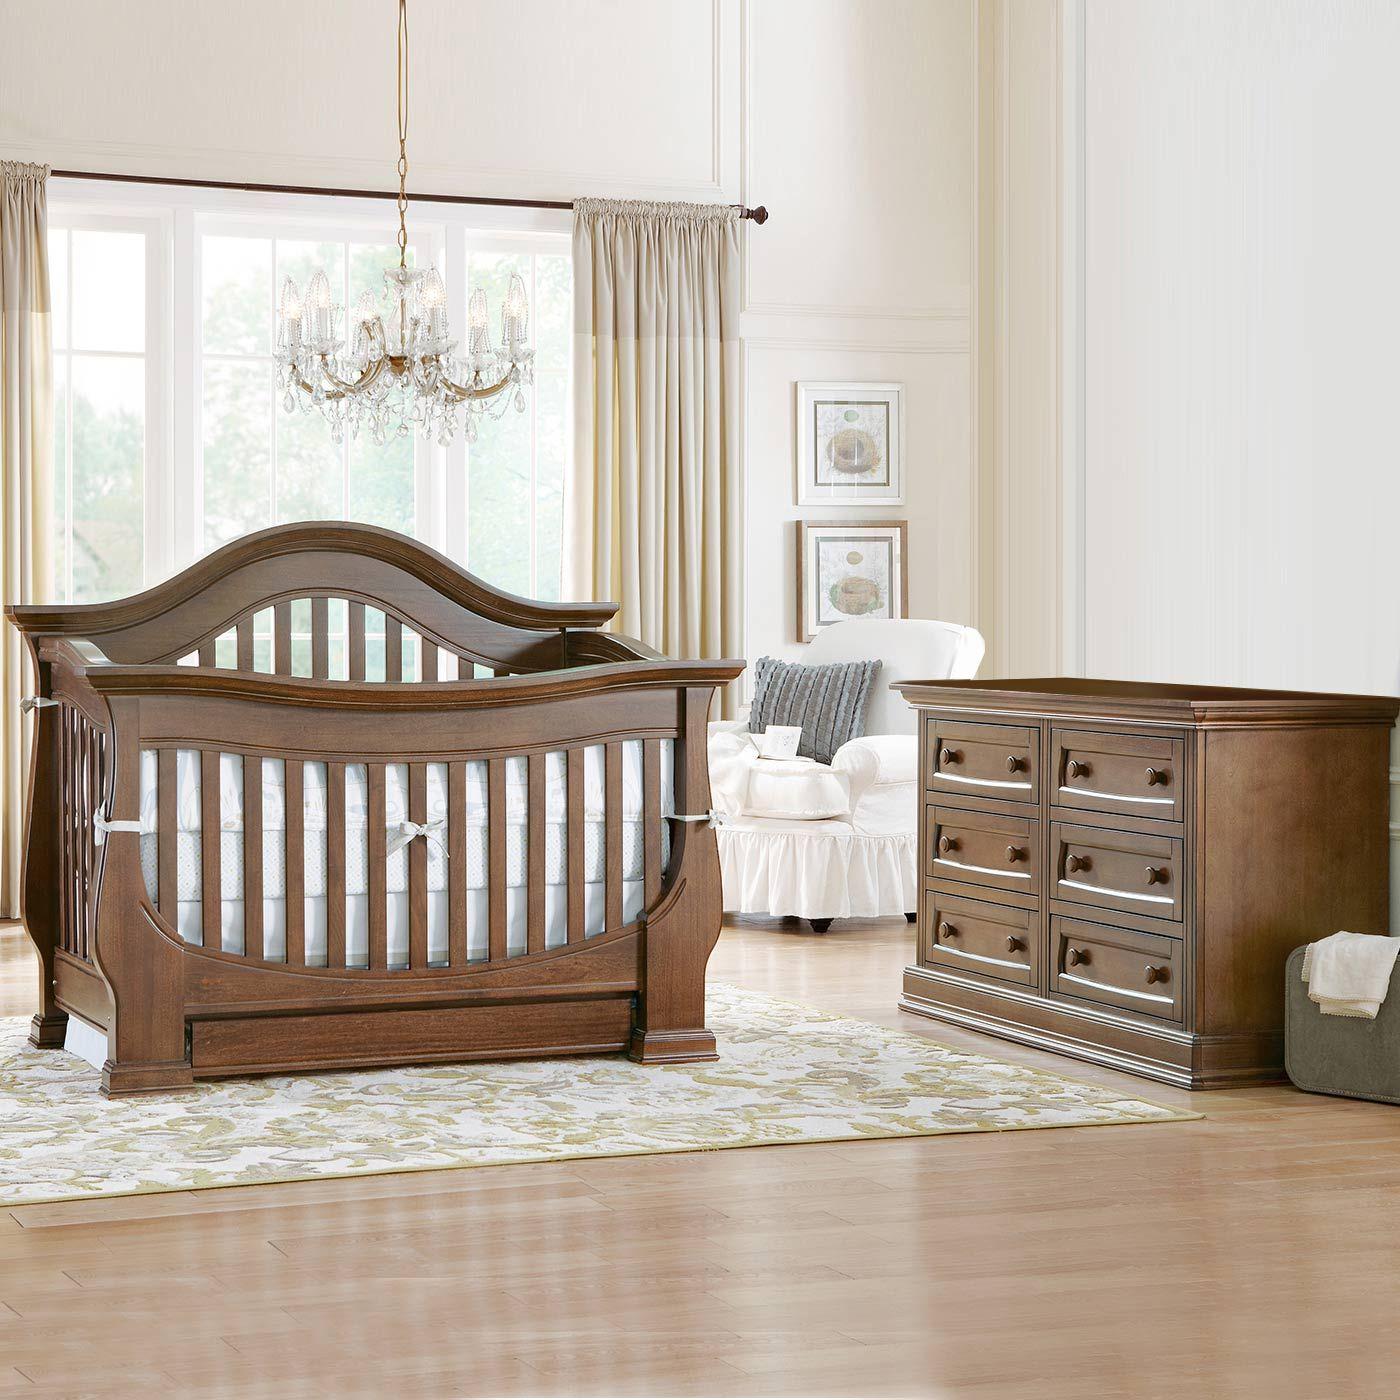 Baby Appleseed 2 Piece Nursery Set Davenport 3in1